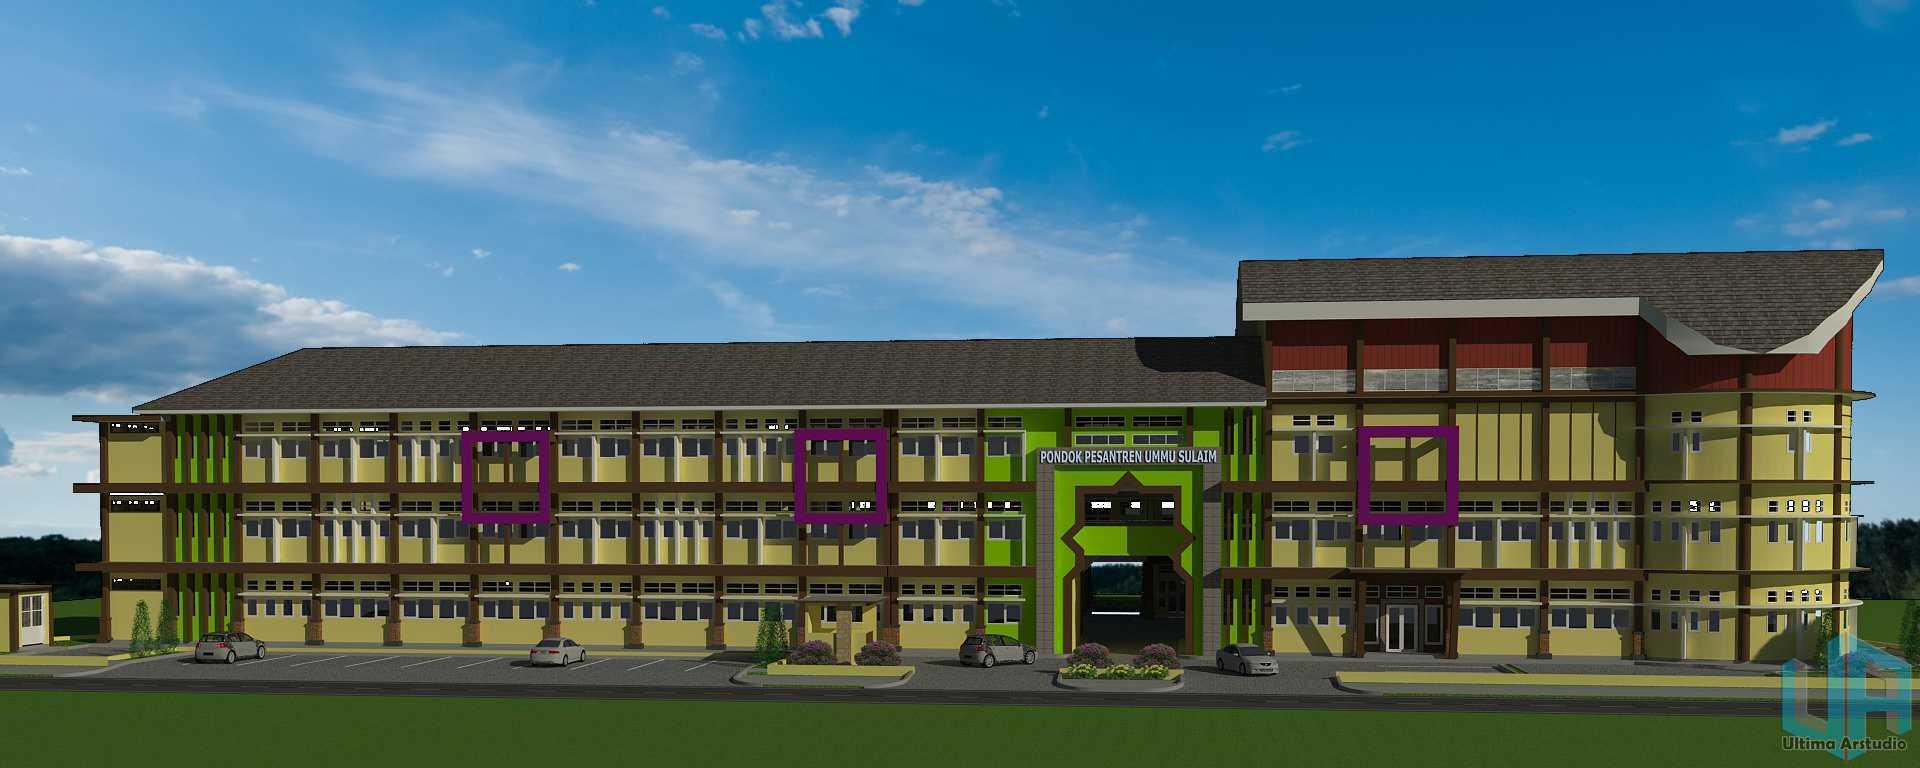 Jasa Arsitek Ultima Arstudio di Riau